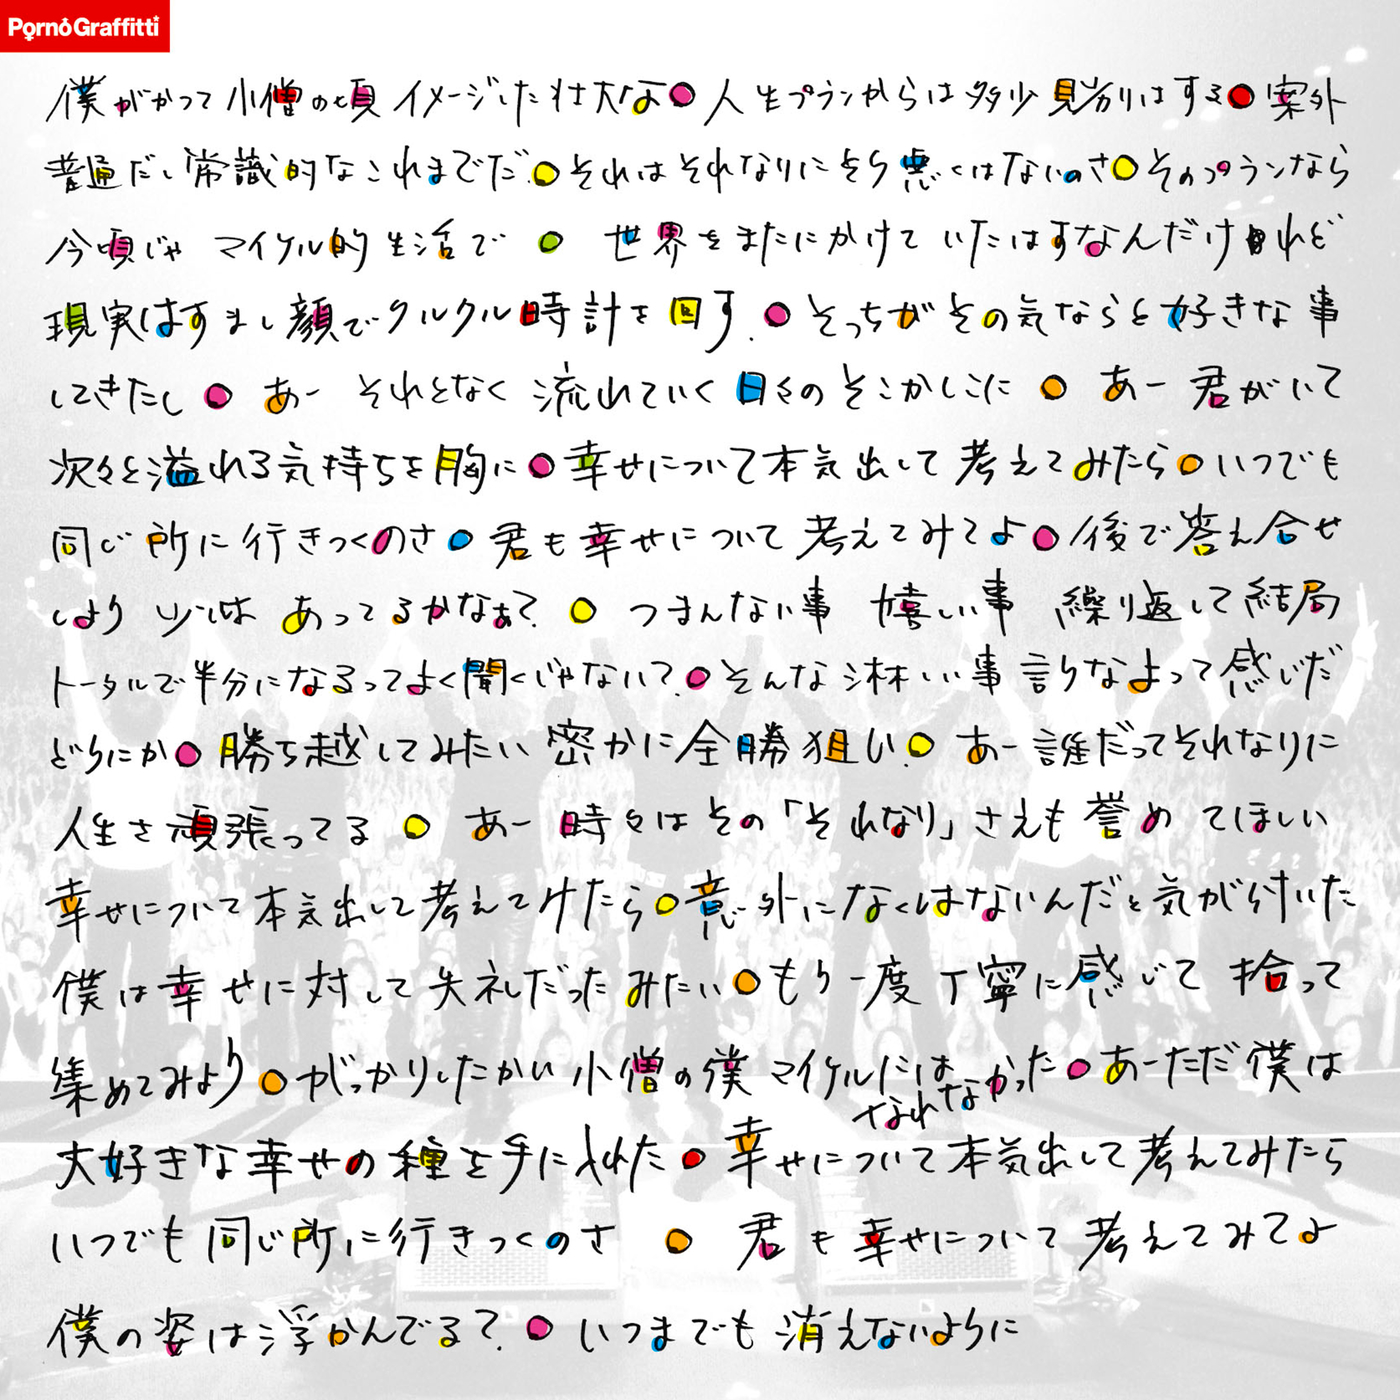 Shiawasenitsuite Honkidashite Kangaetemita - Porno Graffitti